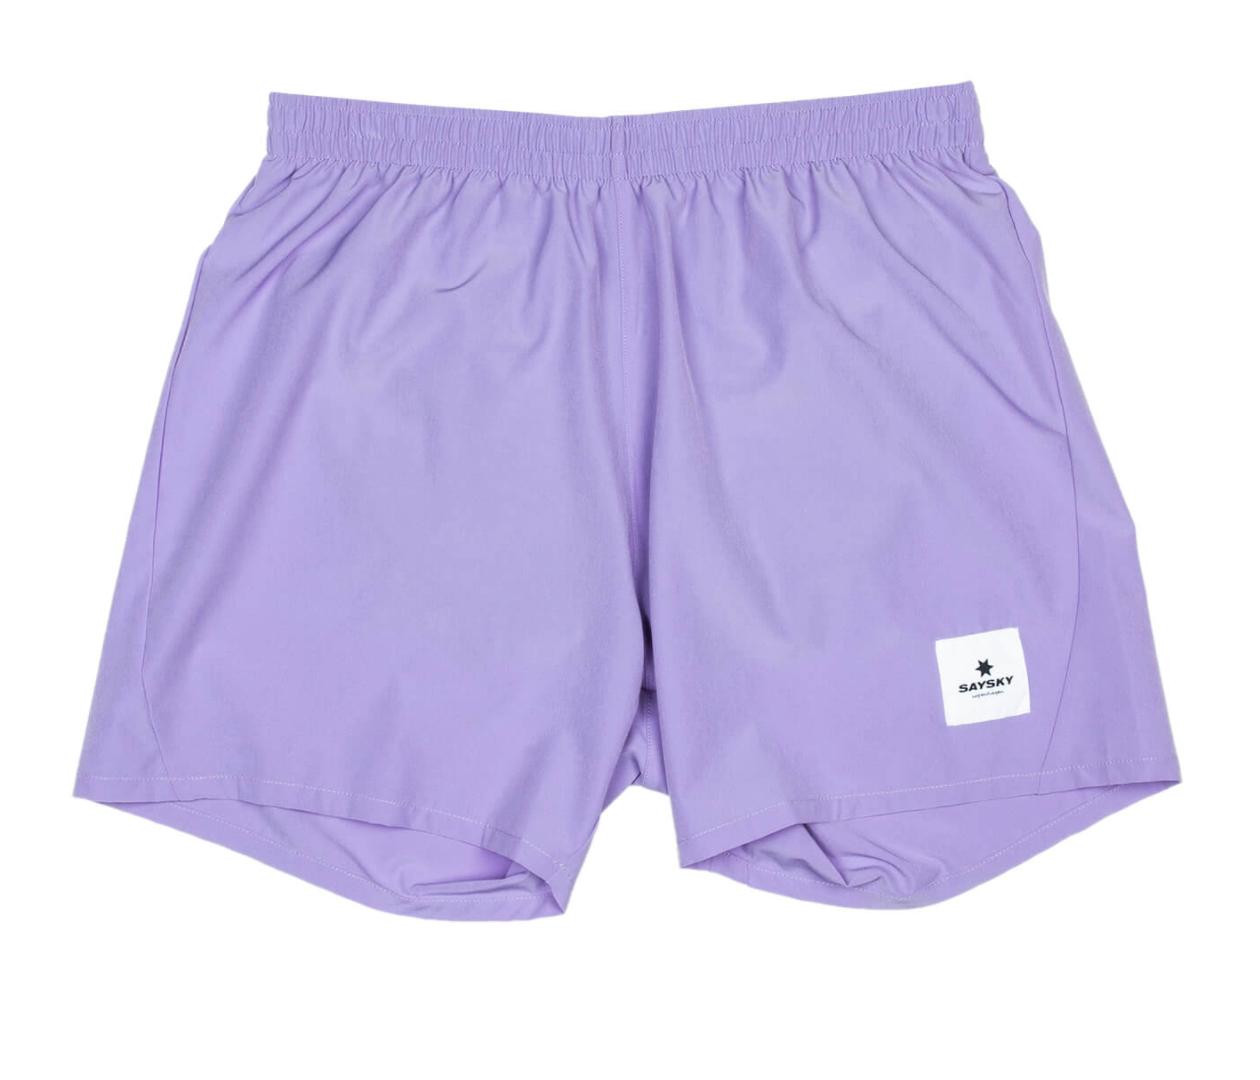 【NEW!】SAYSKY セイスカイ  ランニングショーツ Pace Shorts - SUNLIT ALLIUM [ユニセックス] FMRSH07